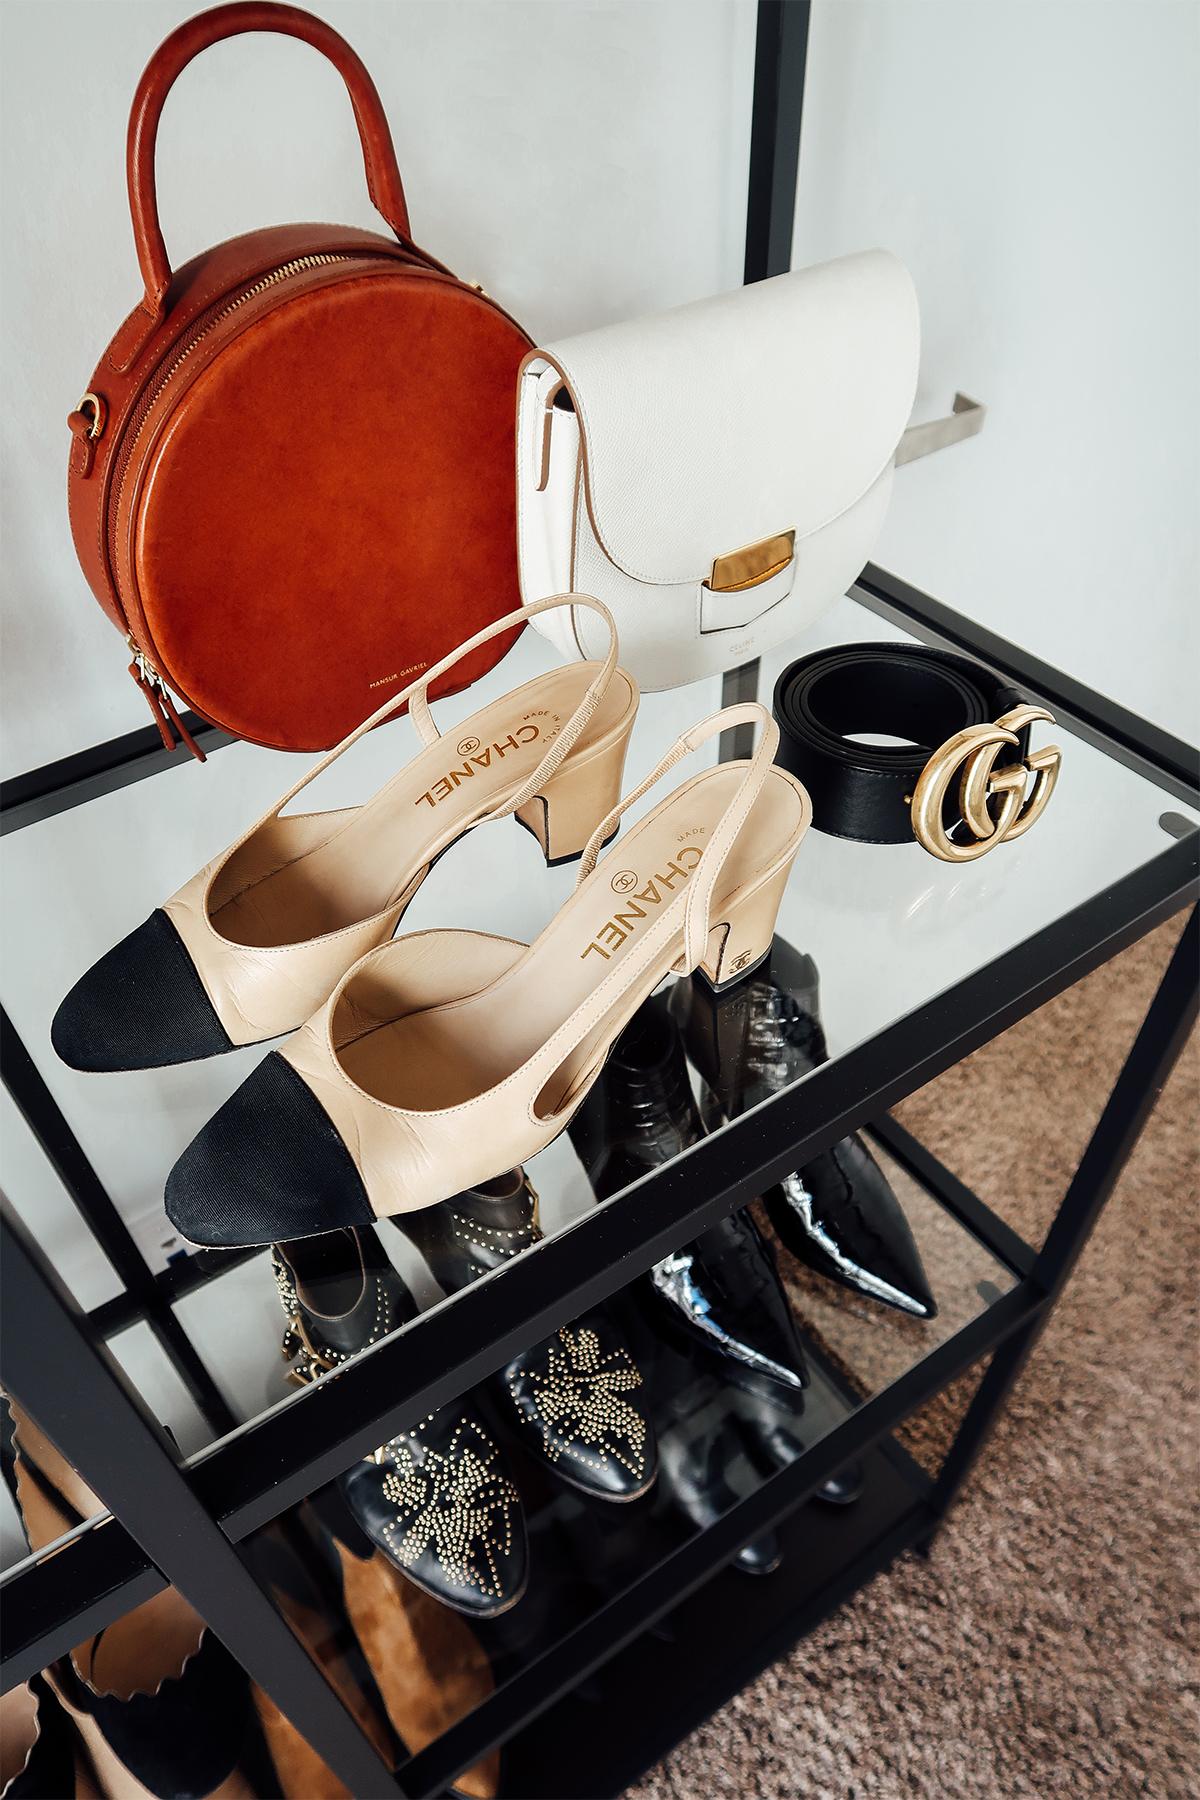 Fashion Jackson Handbag Shoe Collection Chanel Slingbacks Gucci Belt Mansur Gavriel Circle Handbag Celine White Trotteur Handbag